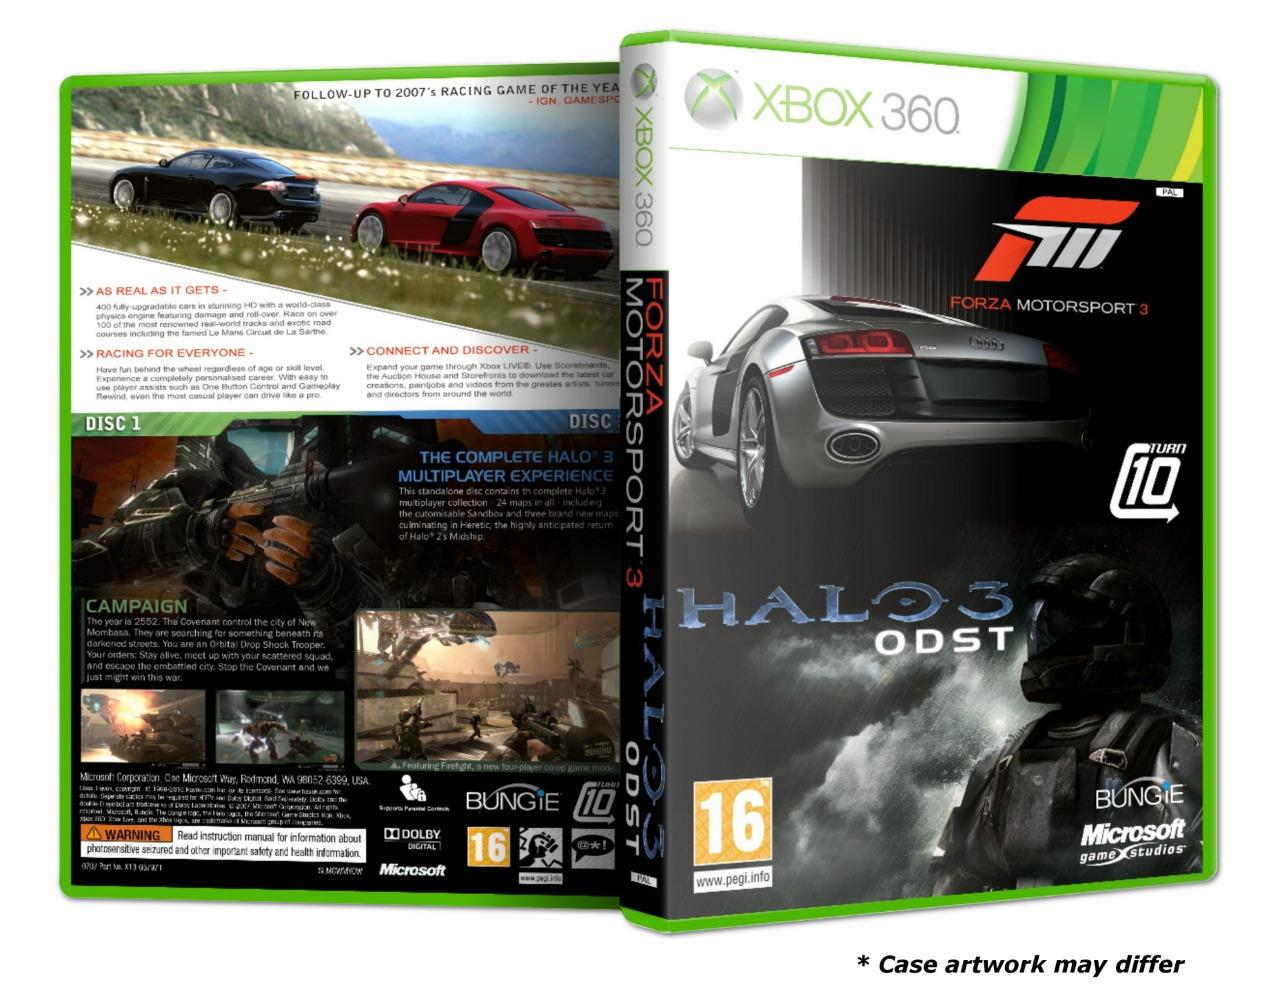 XBOX 360 Forza Motorsport 3 & Halo 3 ODST Bundle Pack 2